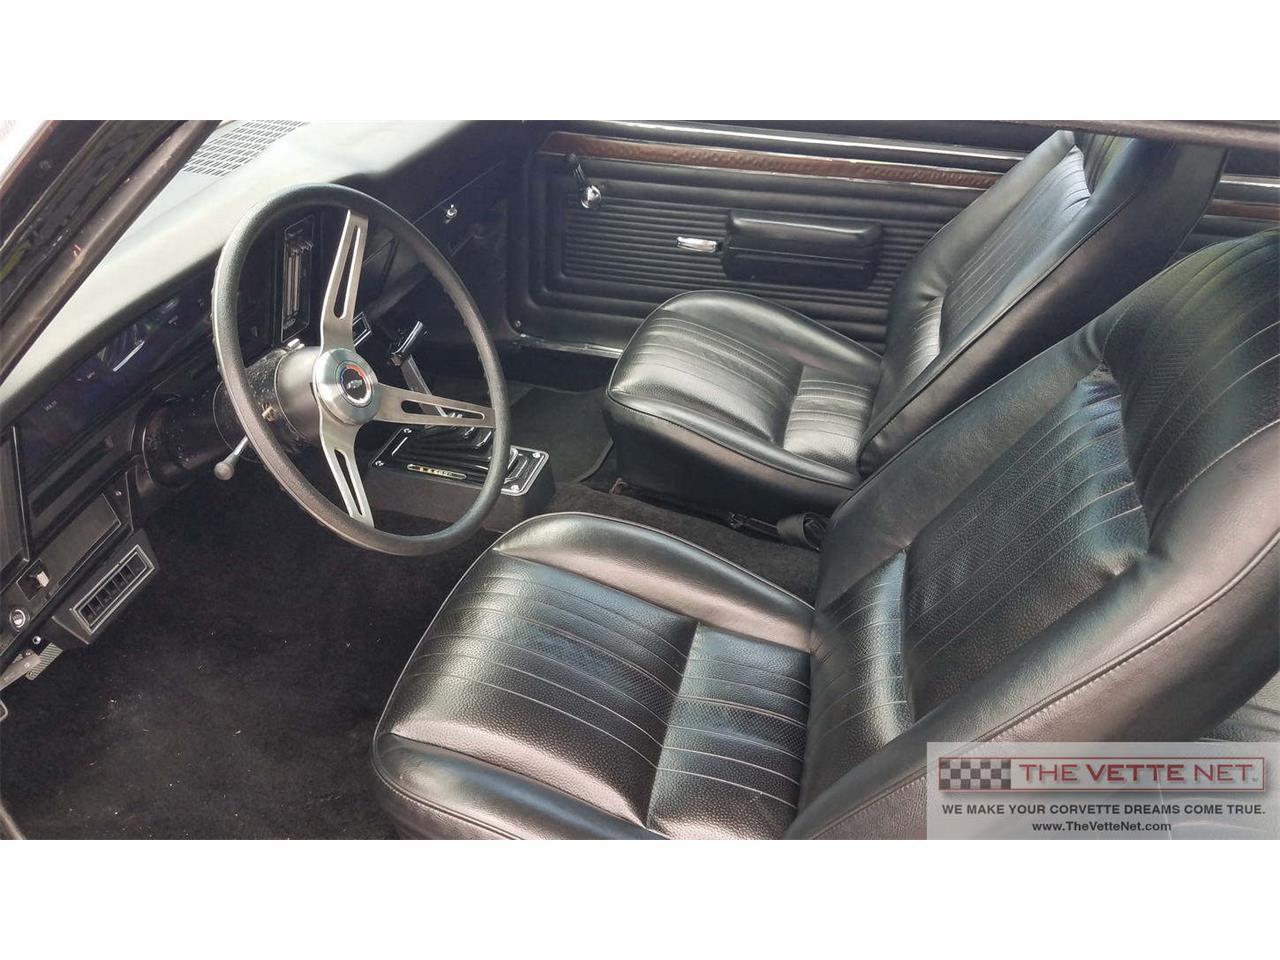 Large Picture of Classic 1972 Nova located in Sarasota Florida - $25,990.00 - LCBP